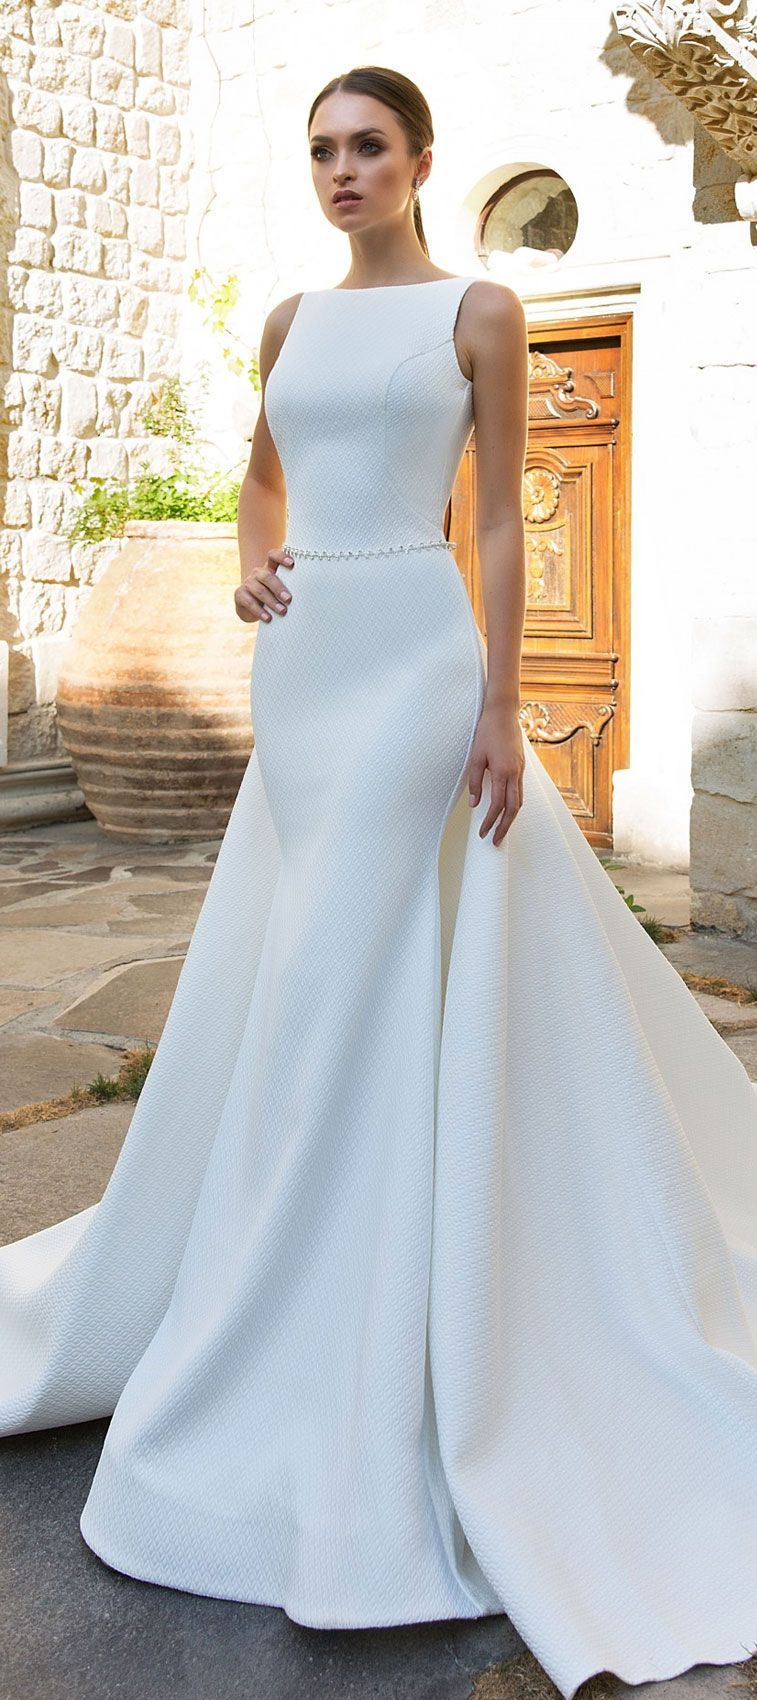 Eva lendel wedding dresses angelic dreams bridal collection eva lendel wedding dresses angelic dreams bridal collection junglespirit Images